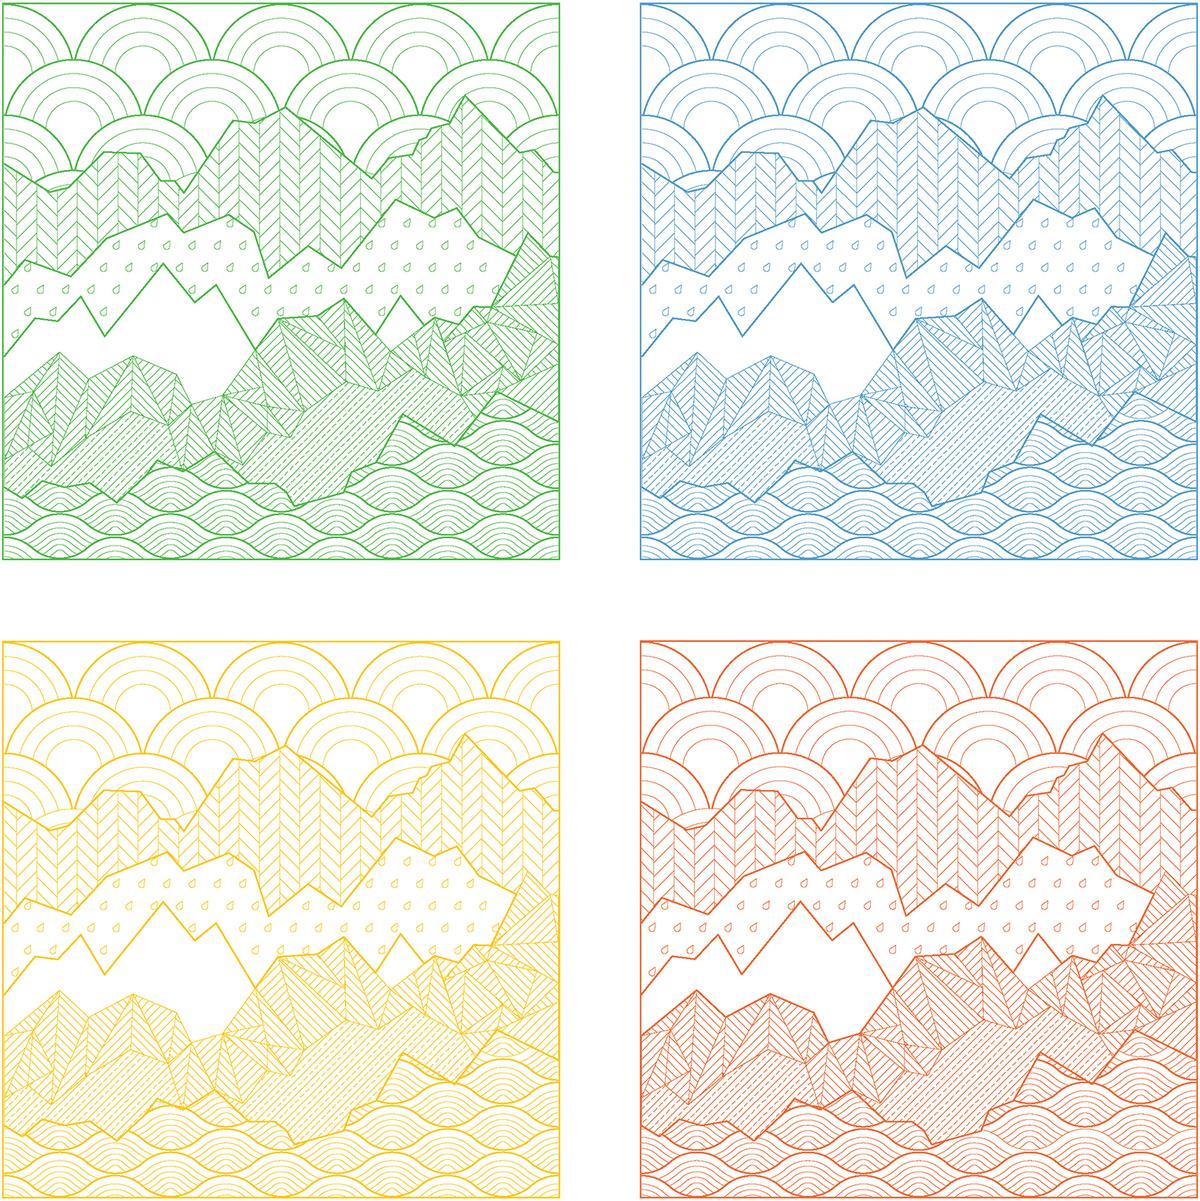 ECO-MONOPOLY nature pattern. Image: Jia Ma